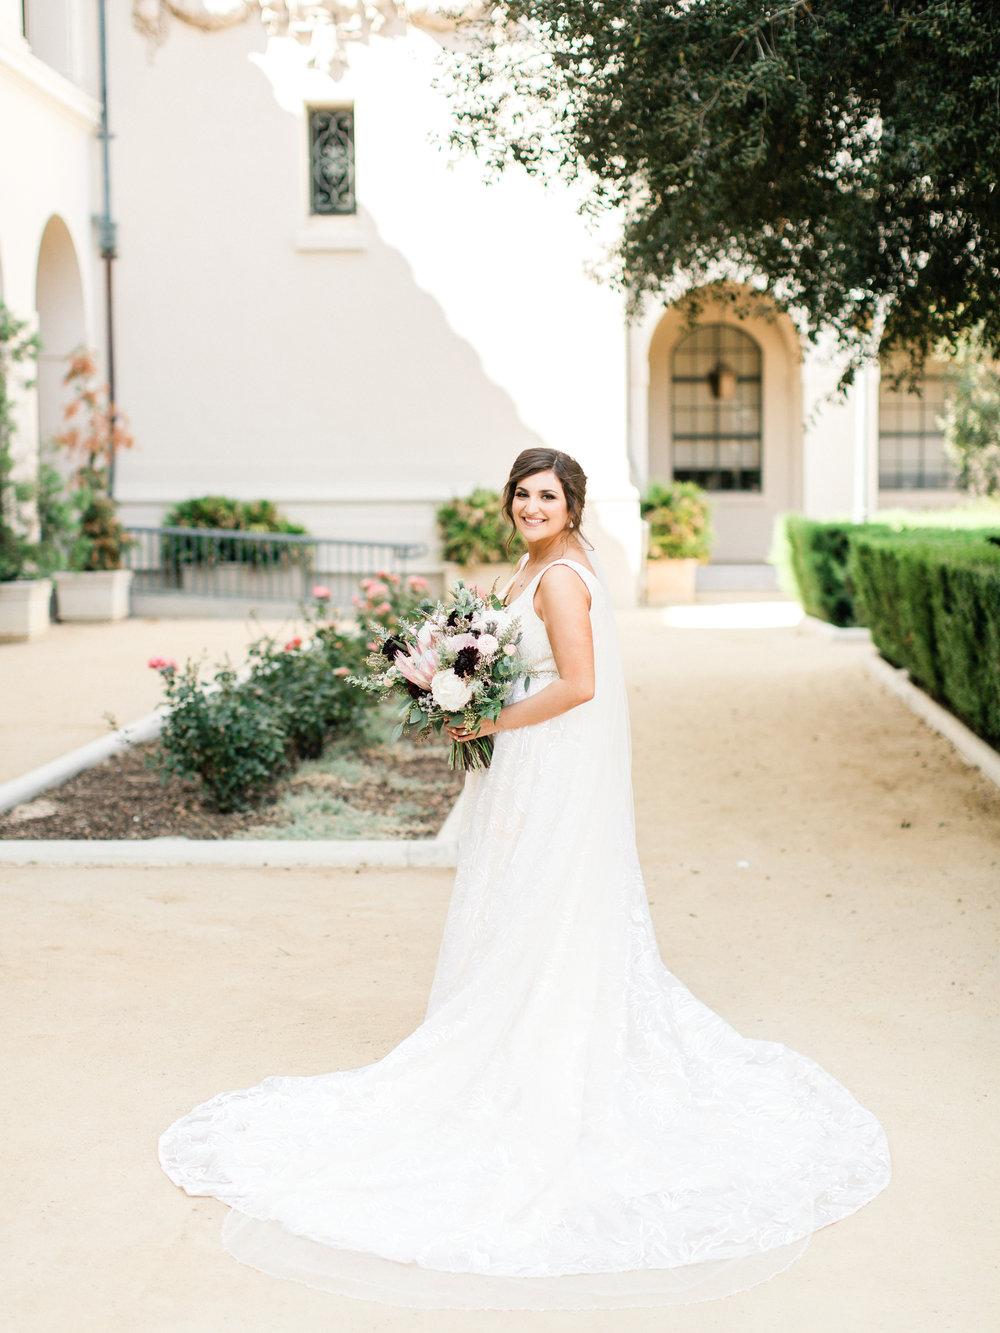 Ari-Jordan-Pasadena-City-Hall-Noor-Wedding-59.jpg